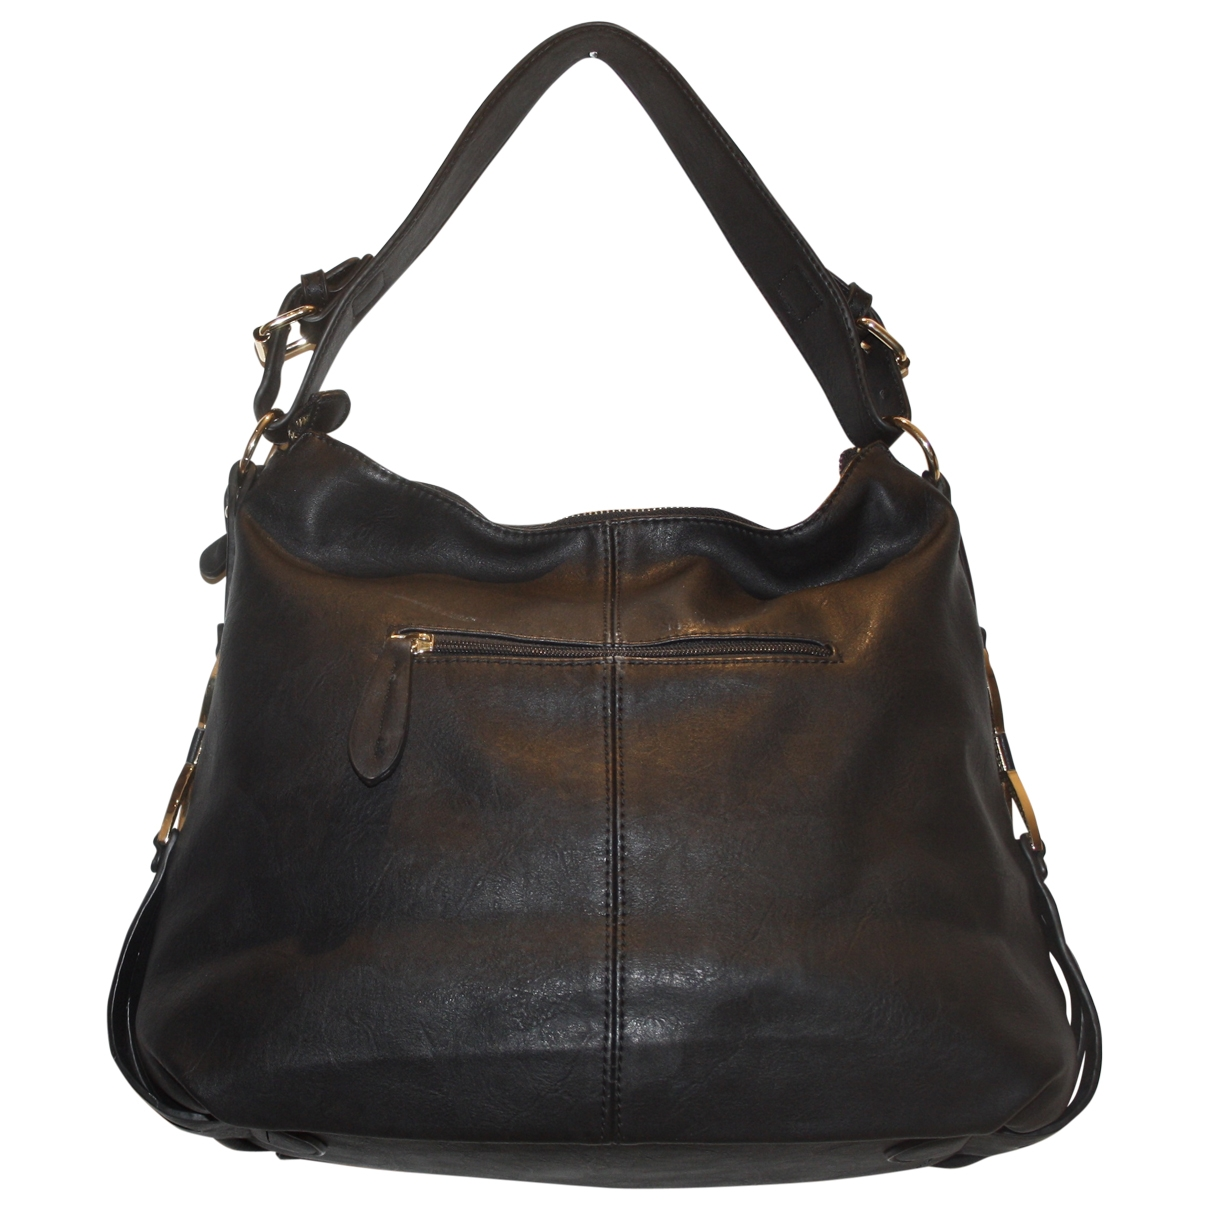 Krizia \N Black handbag for Women \N